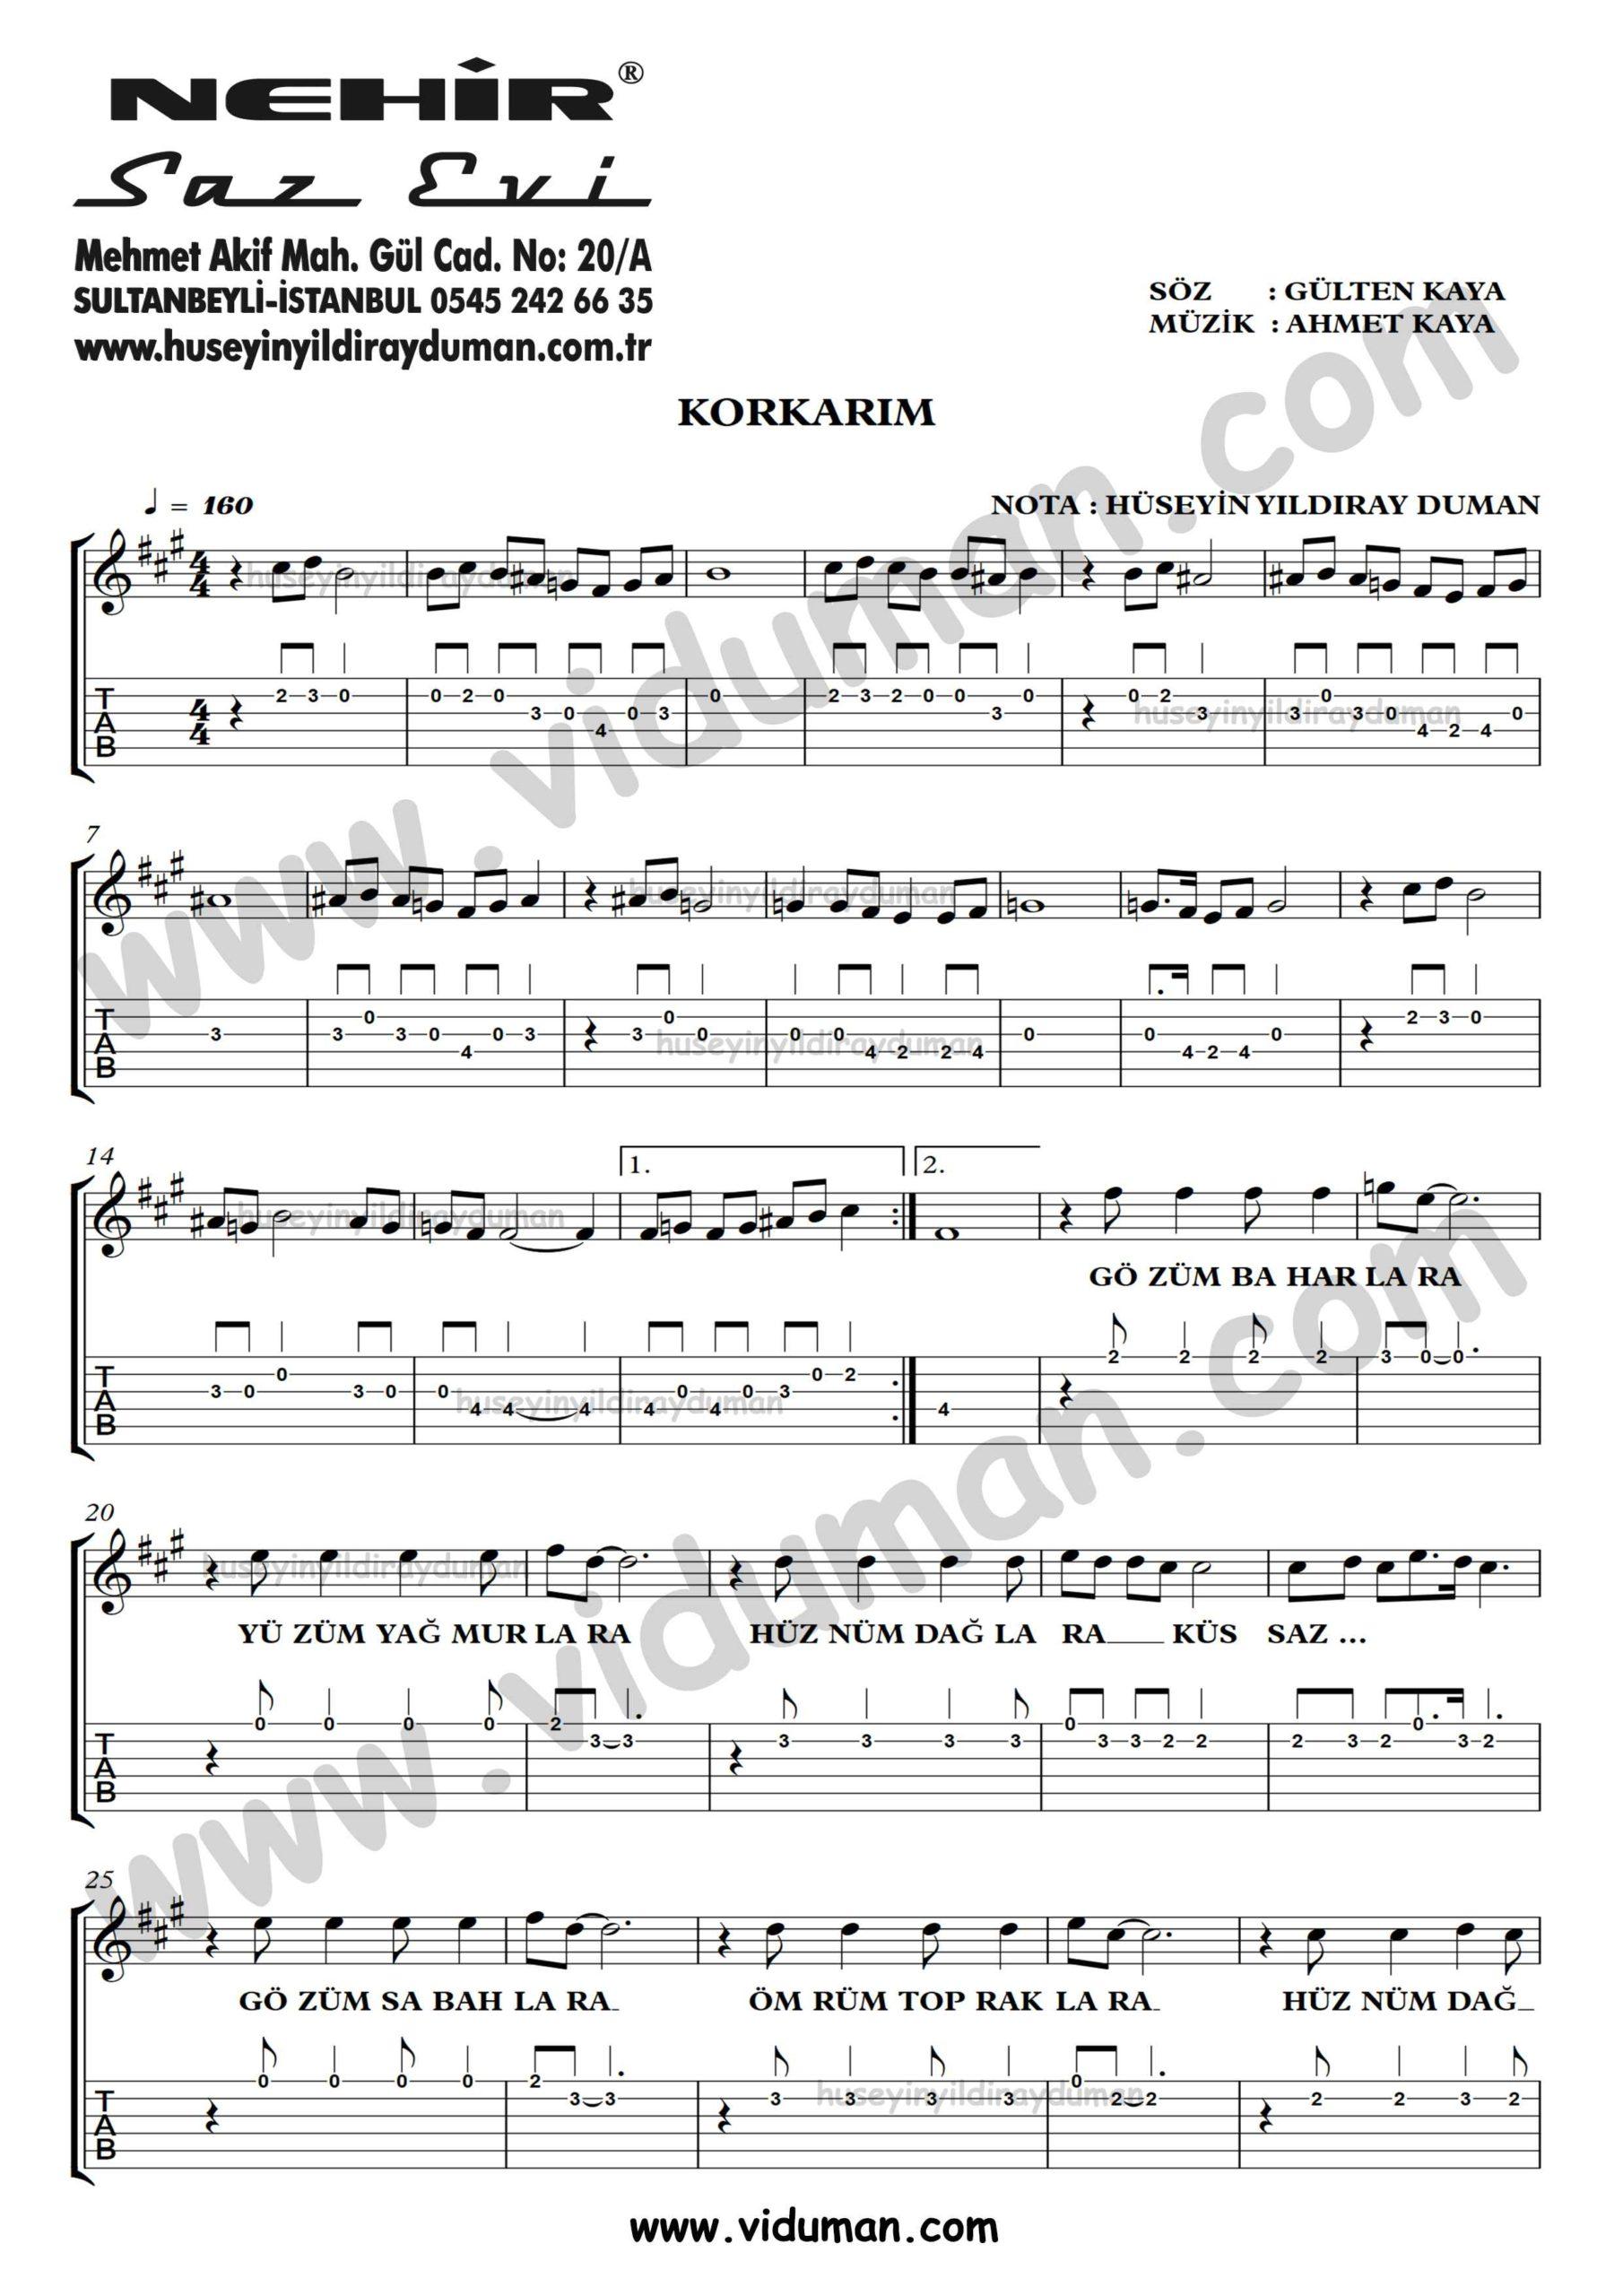 Korkarim_1-Ahmet Kaya-Gitar Tab-Solo Notalari